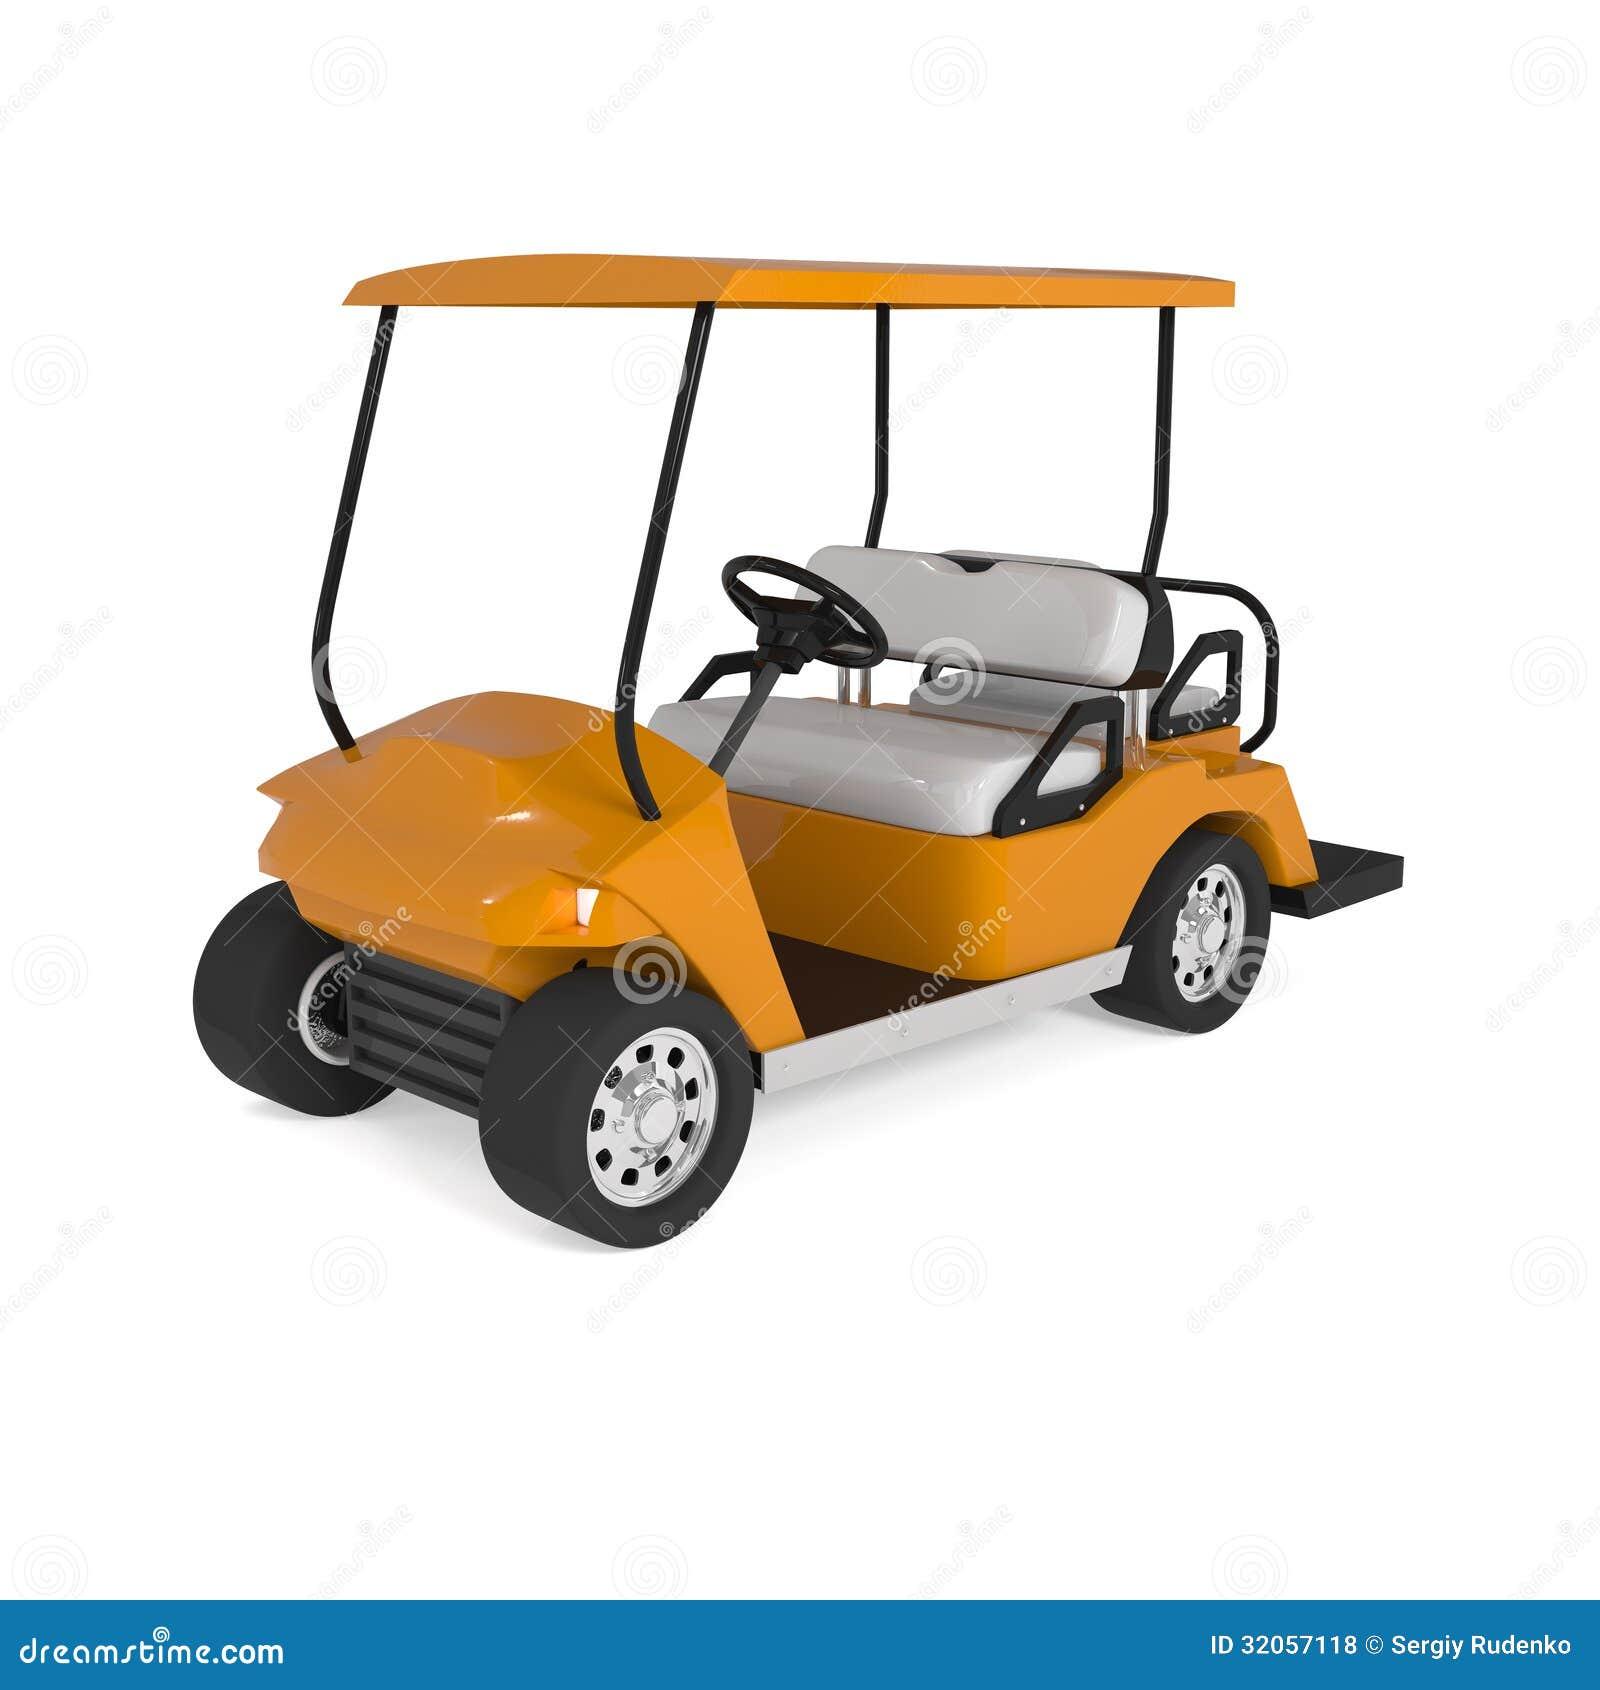 10251332 likewise Product also Bag Carolina Herrera together with File Cigarette holder likewise 26789748. on golf cart bag canopy